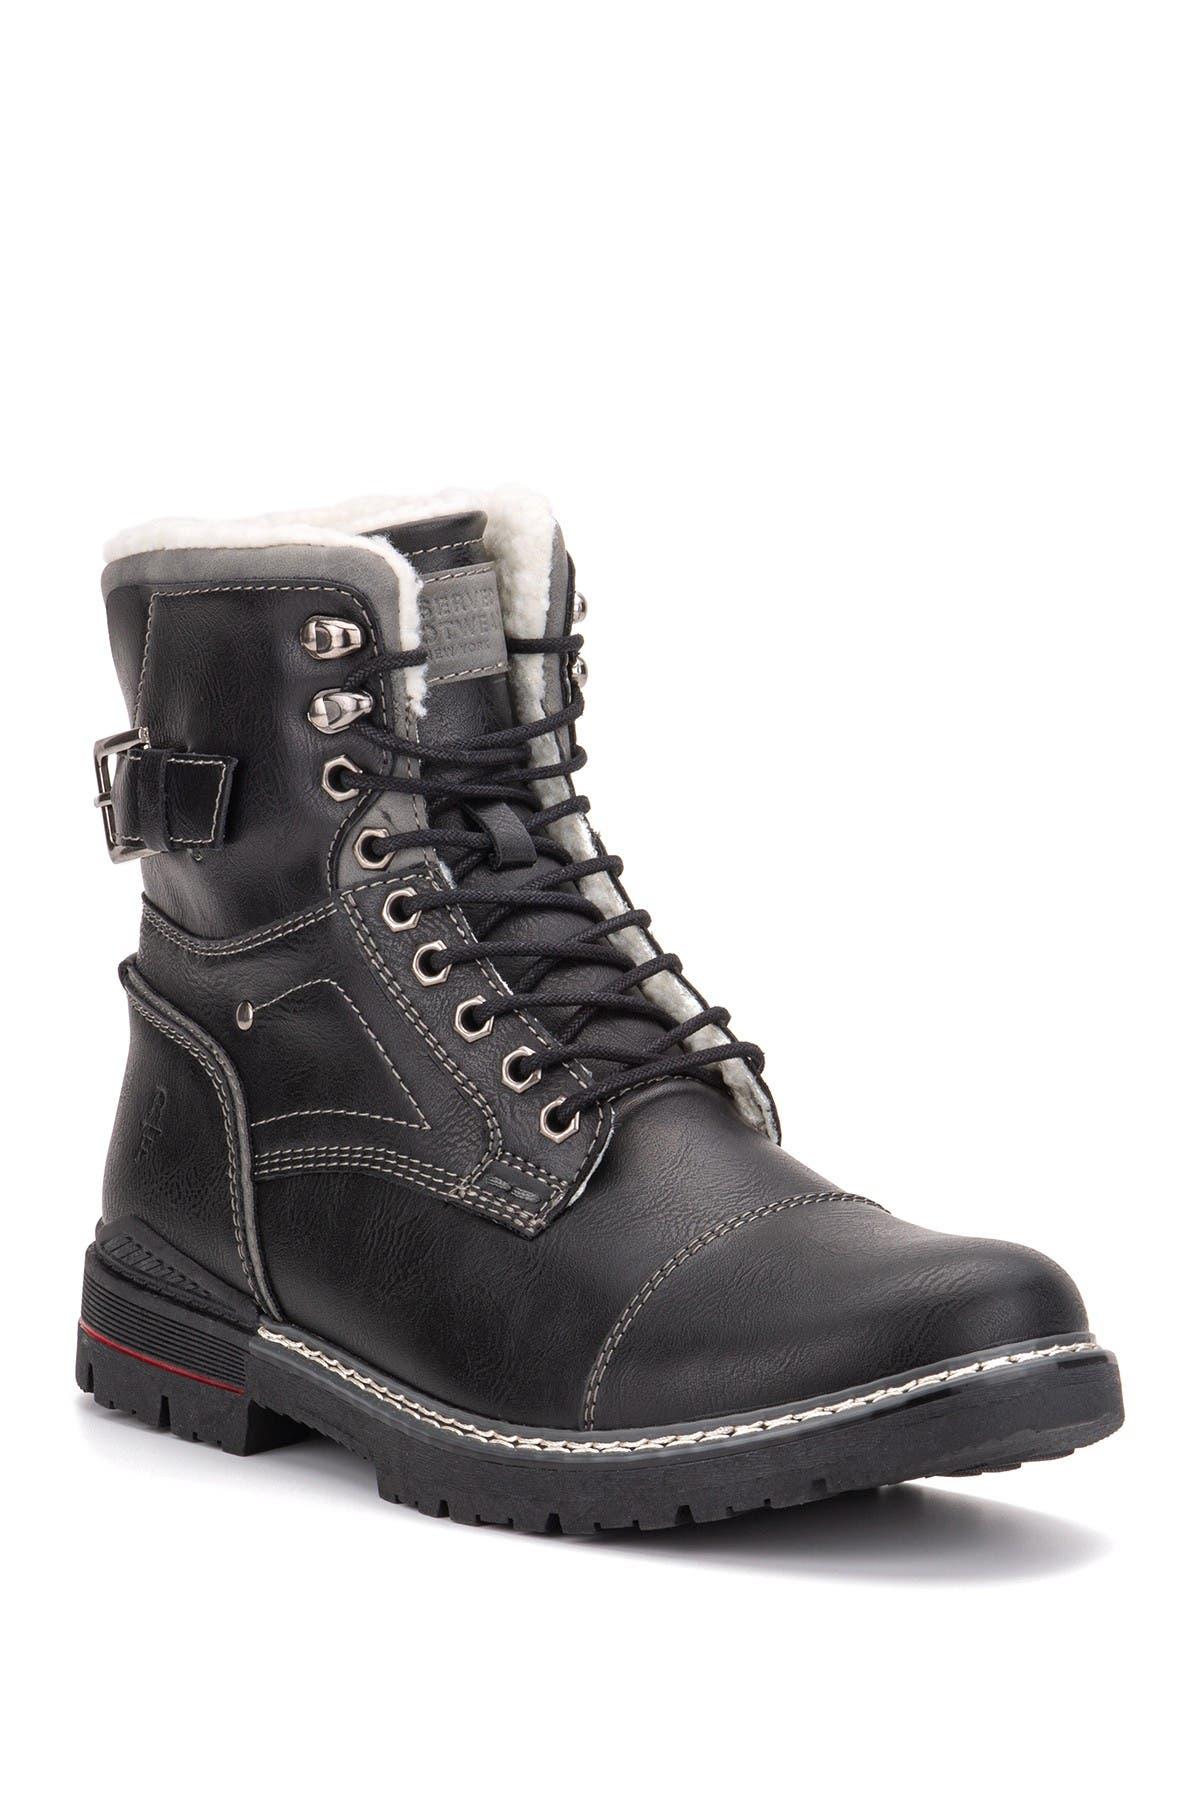 Image of Reserved Footwear Cavalier Boot